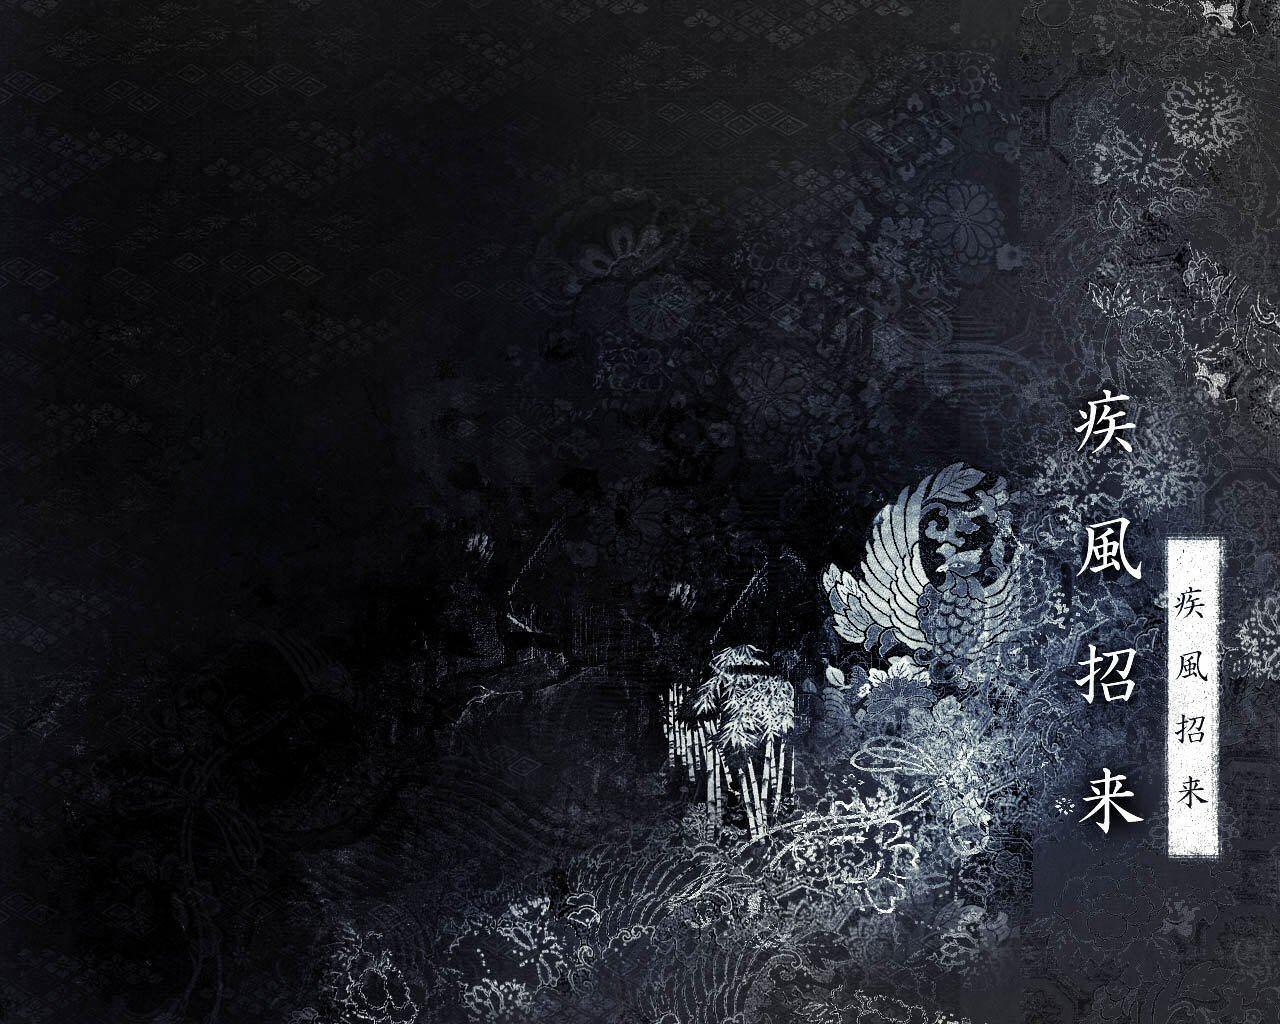 http://4.bp.blogspot.com/-HX-JkCluCsc/Tl9DoPGQtcI/AAAAAAAAAlE/ixYK2kdOpXk/s1600/Drawn_wallpapers_Japanese_characters_022428_.jpg